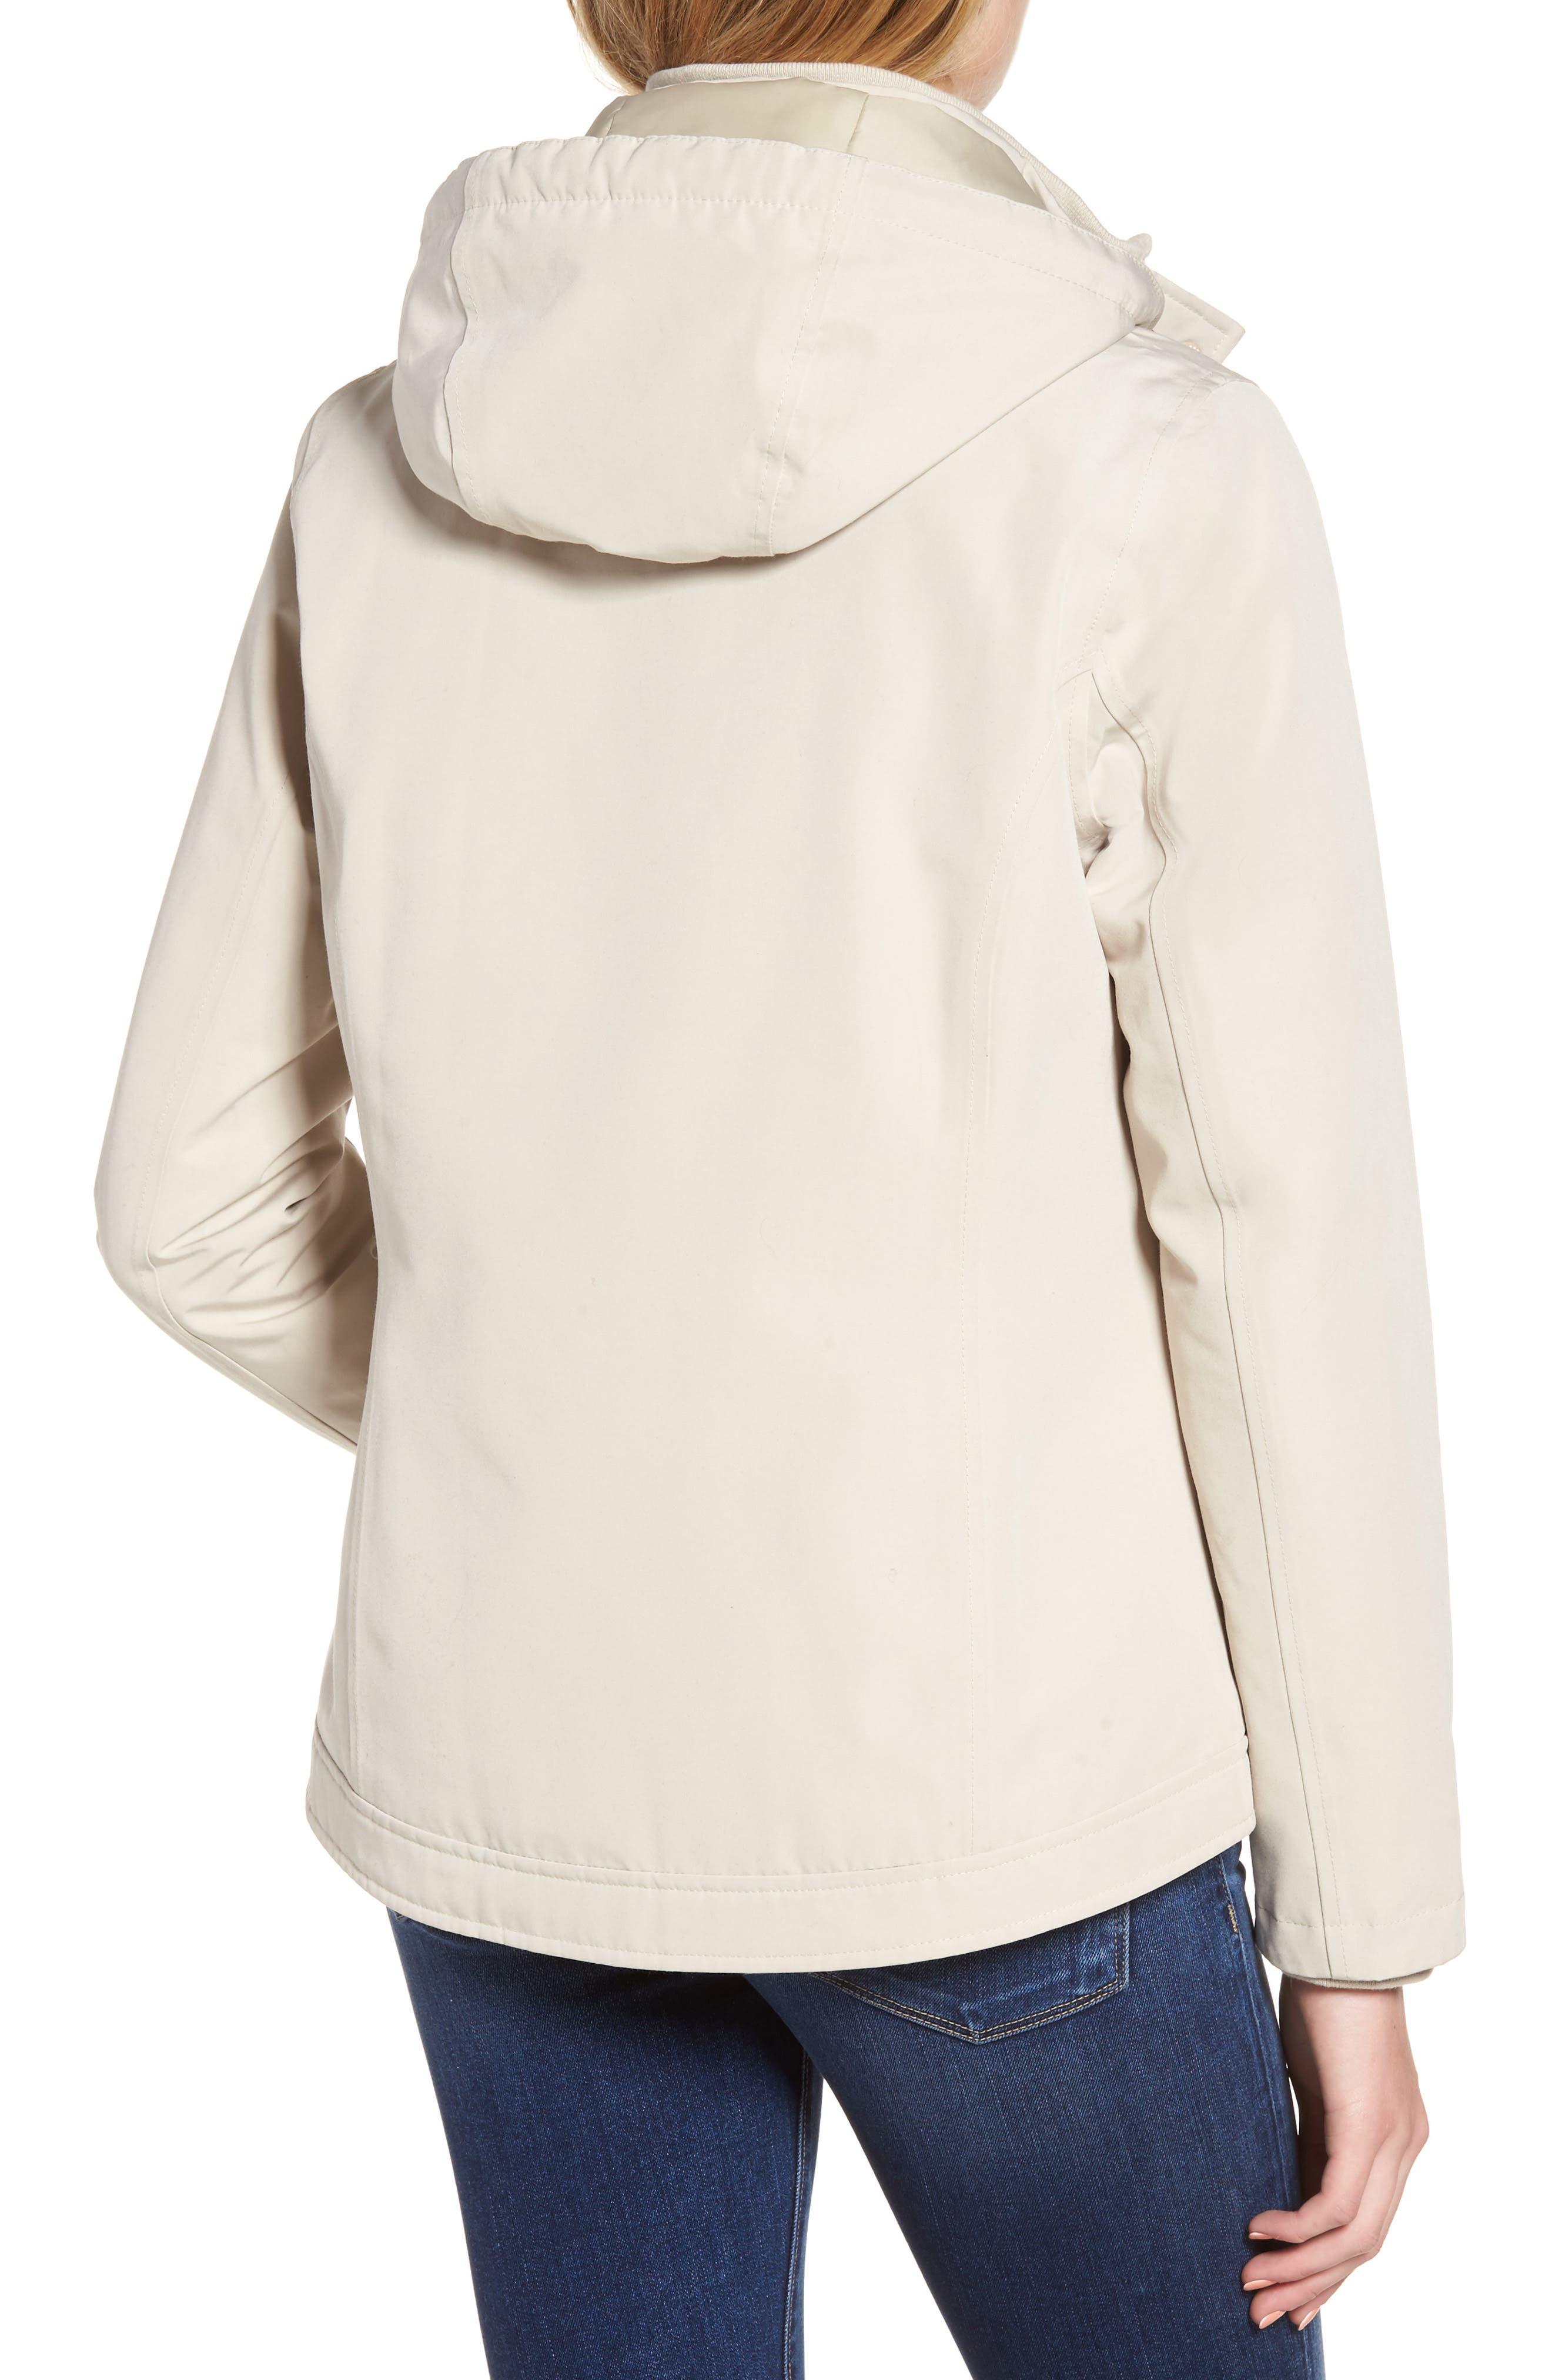 Seaton Hooded Waterproof Jacket,                             Alternate thumbnail 2, color,                             Mist